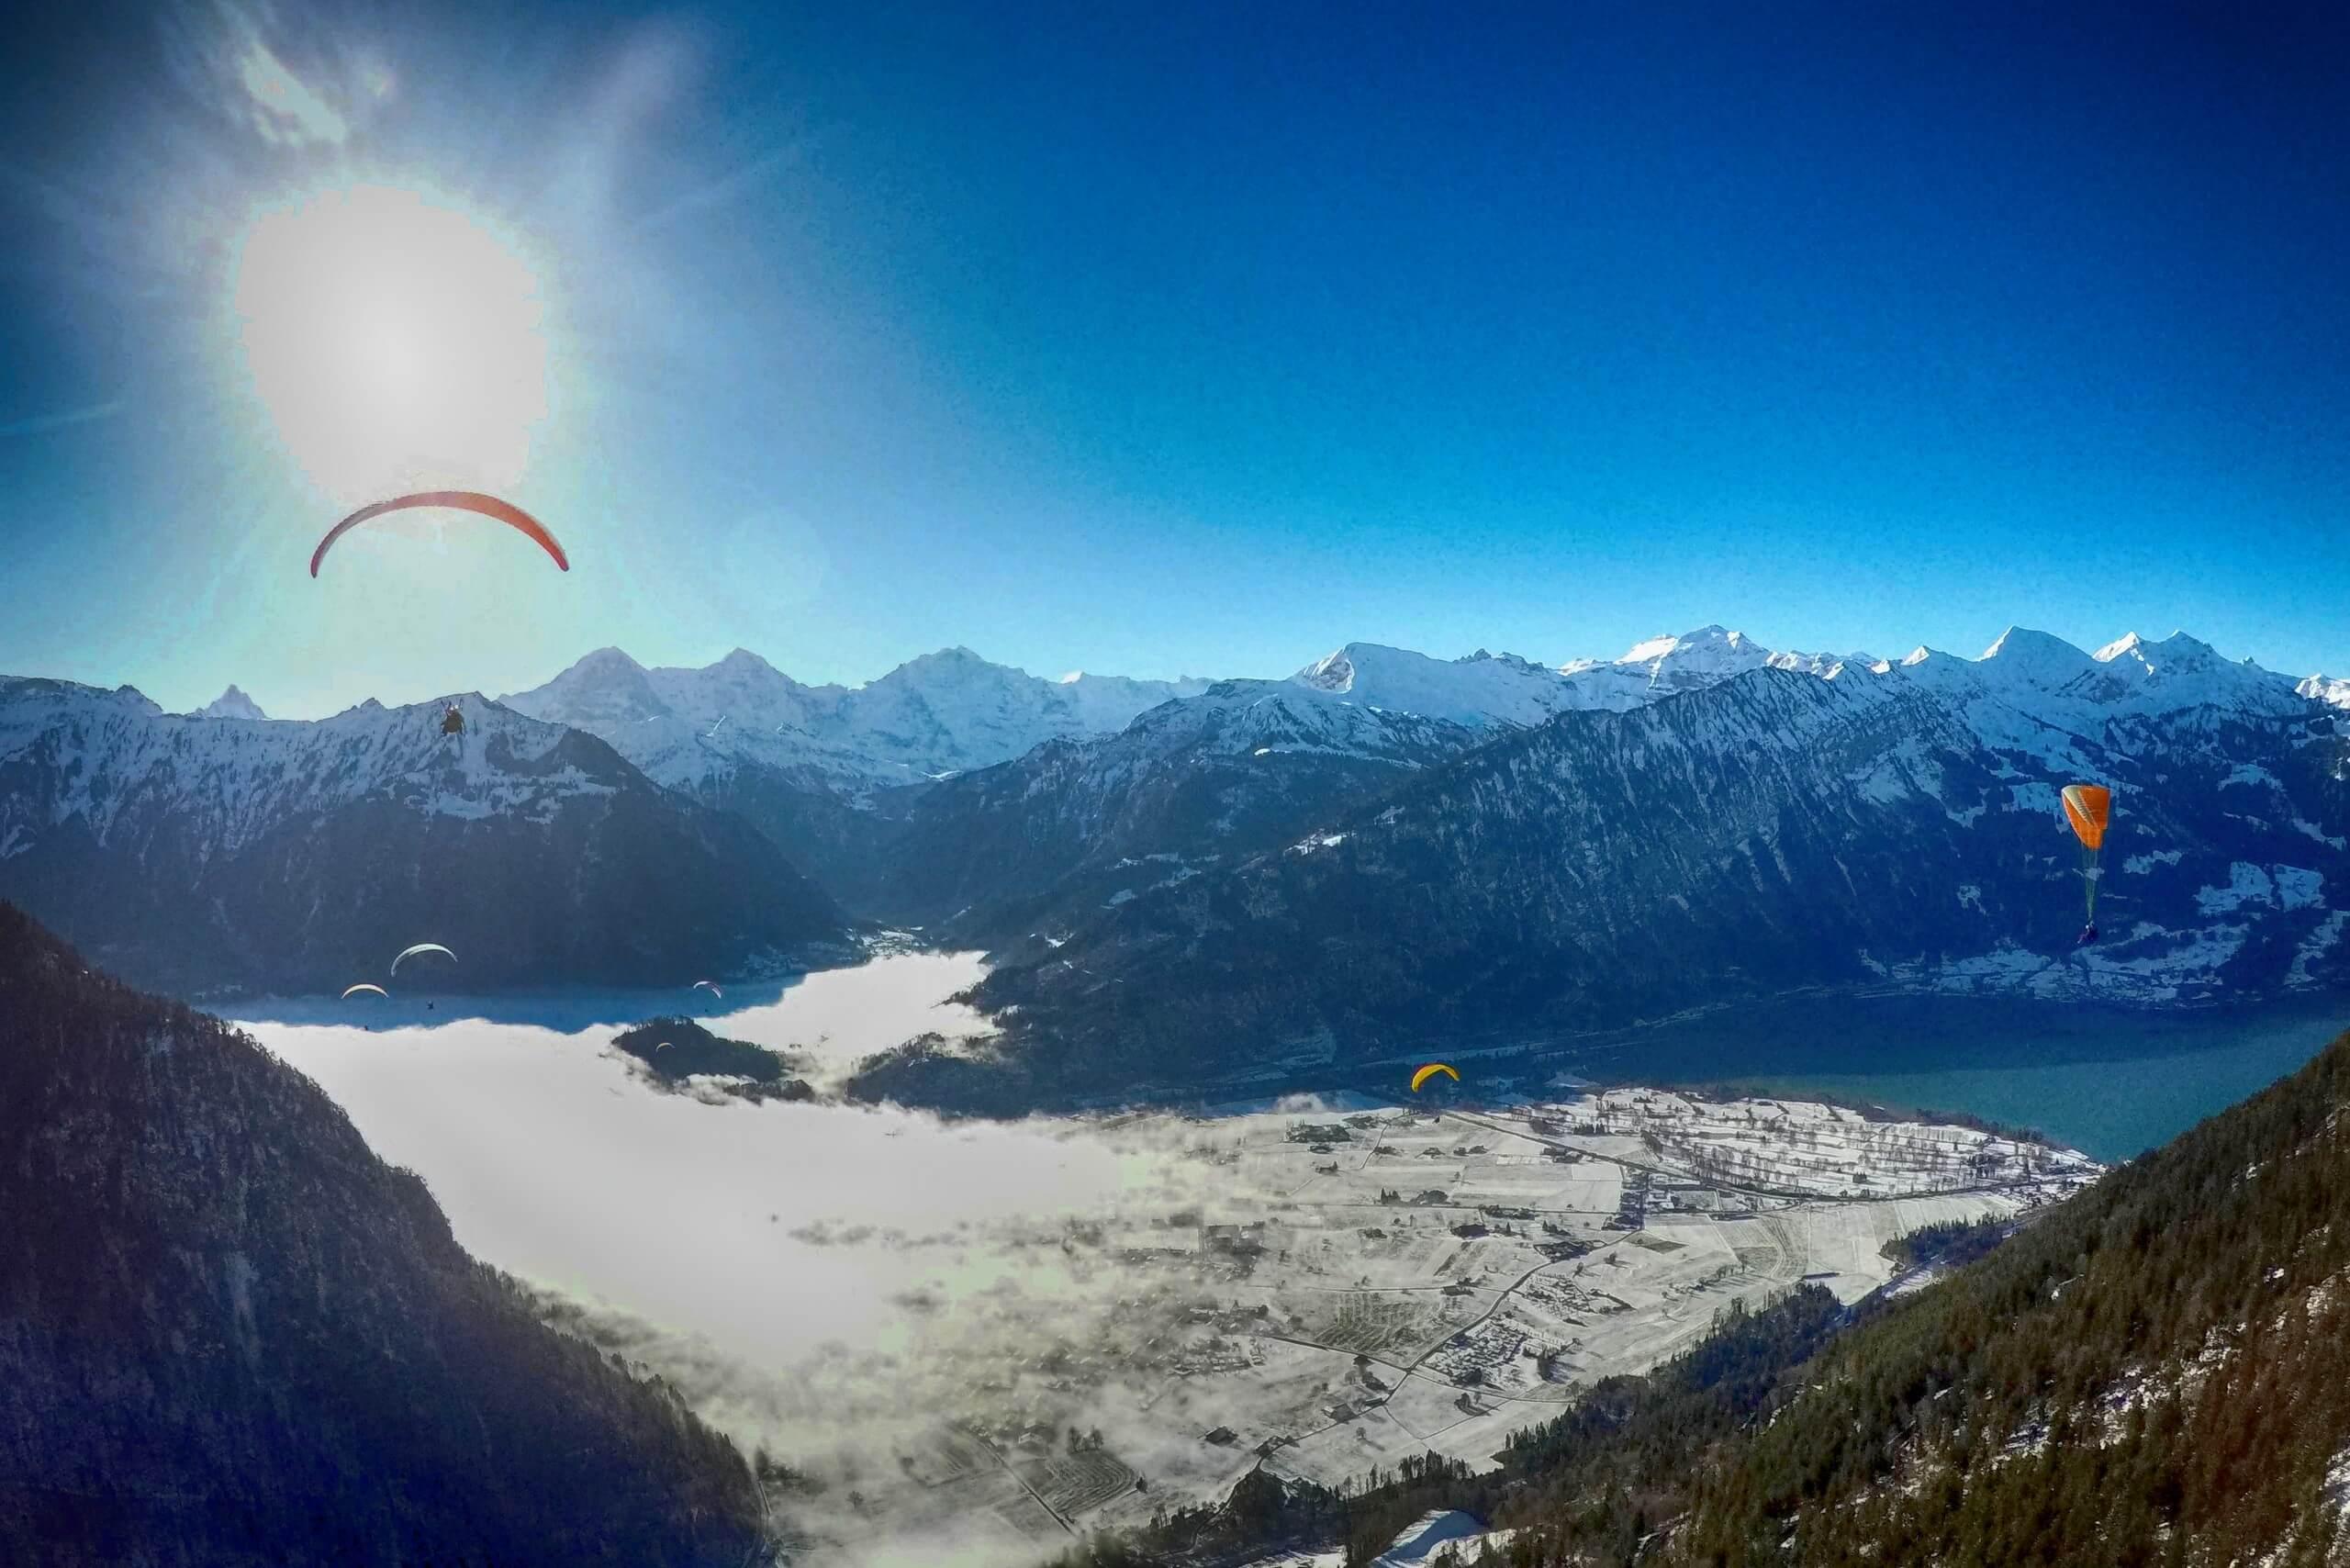 interlaken-paragliding-alpinair-interlaken-winter